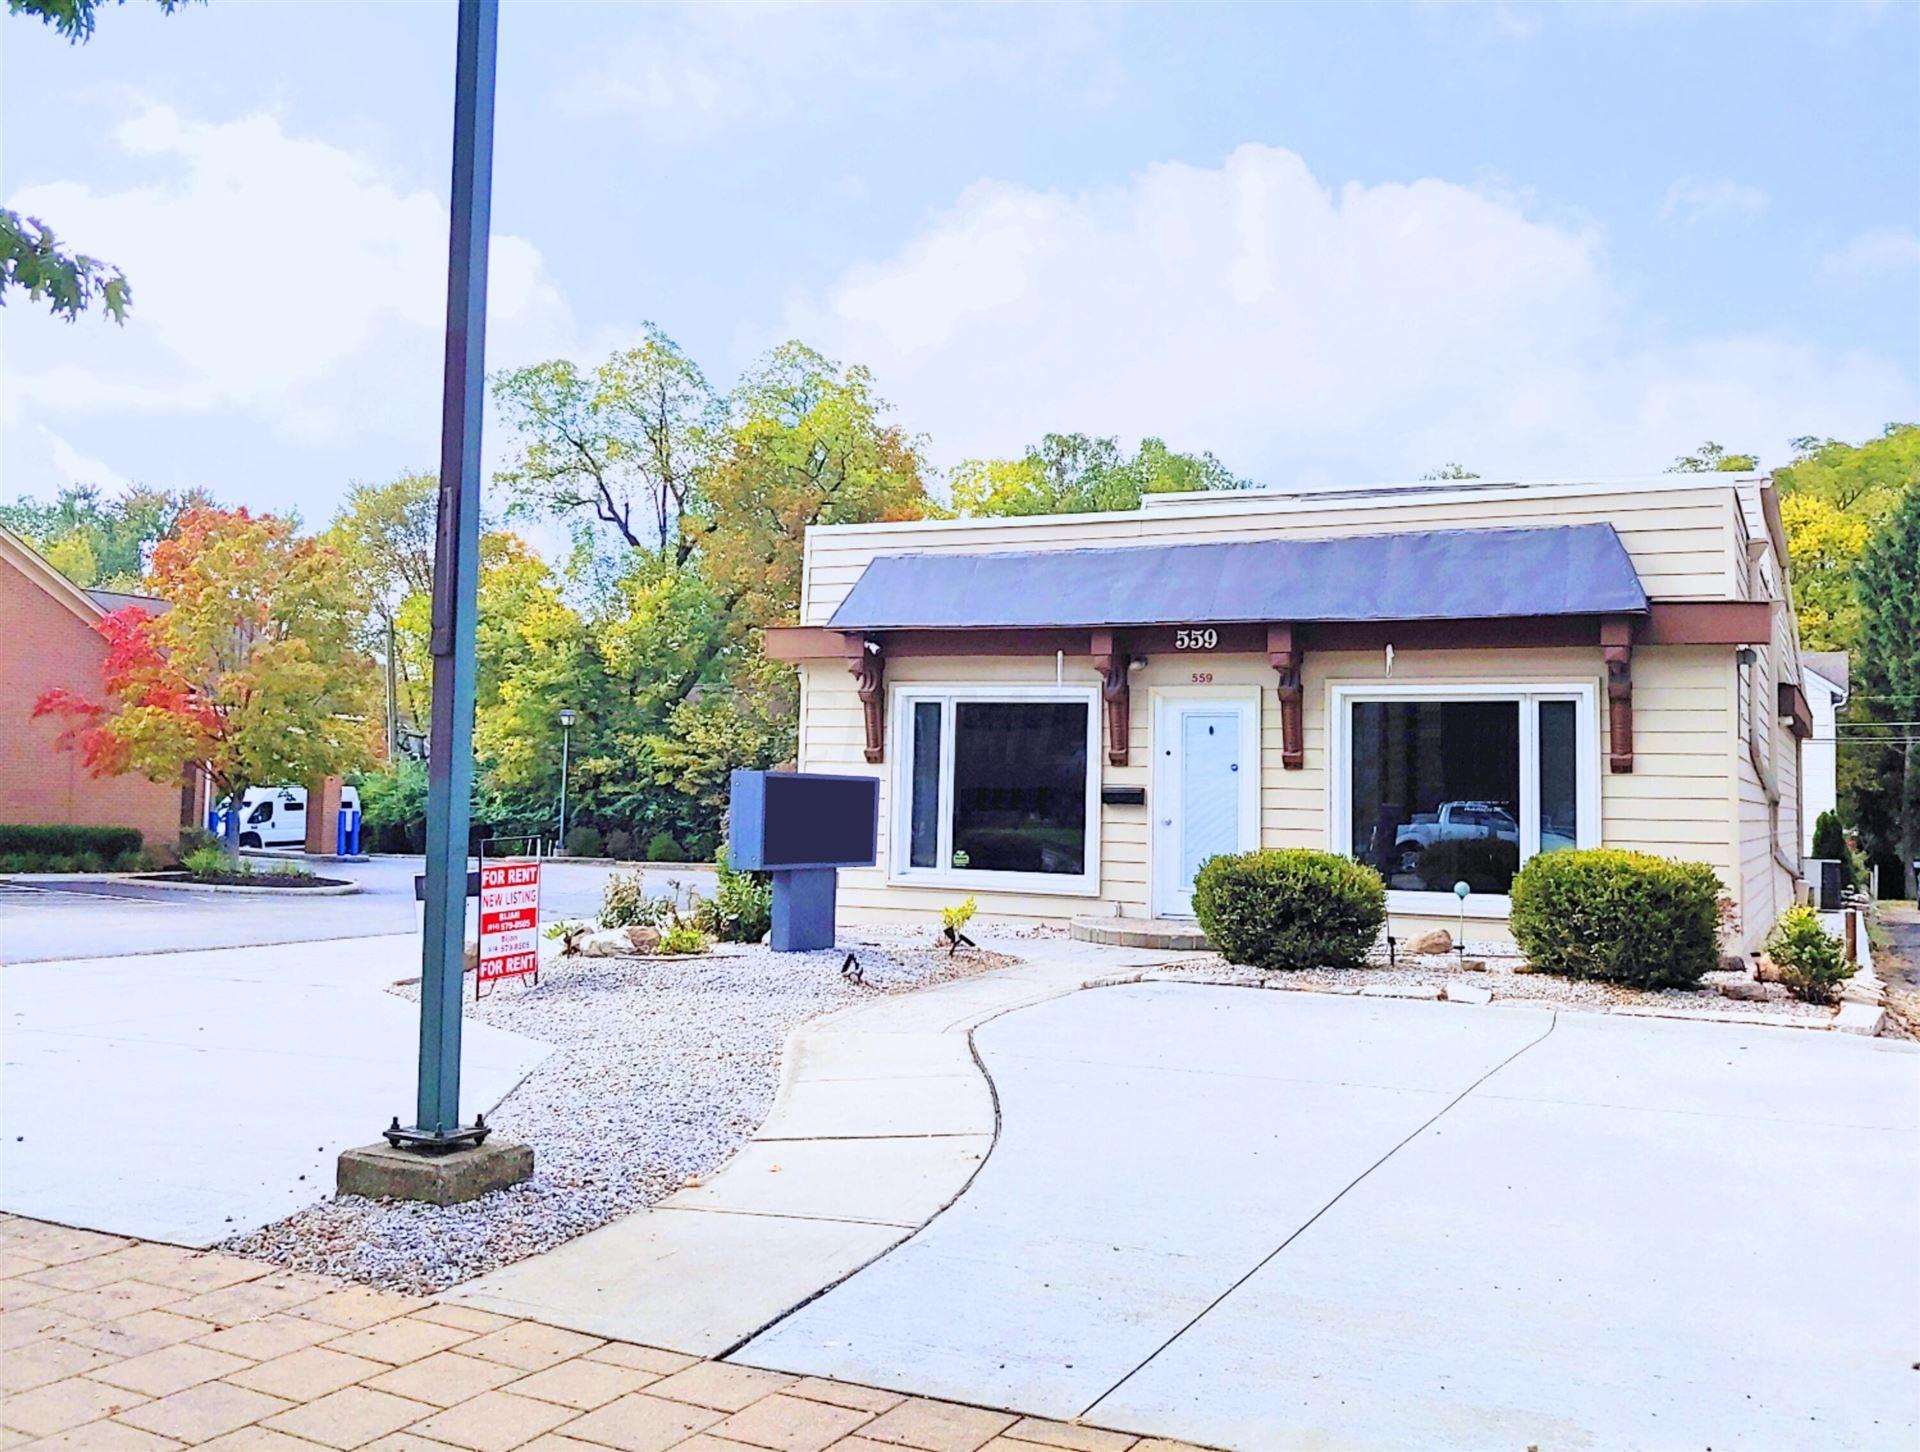 Photo of 559 High Street, Worthington, OH 43085 (MLS # 221036738)